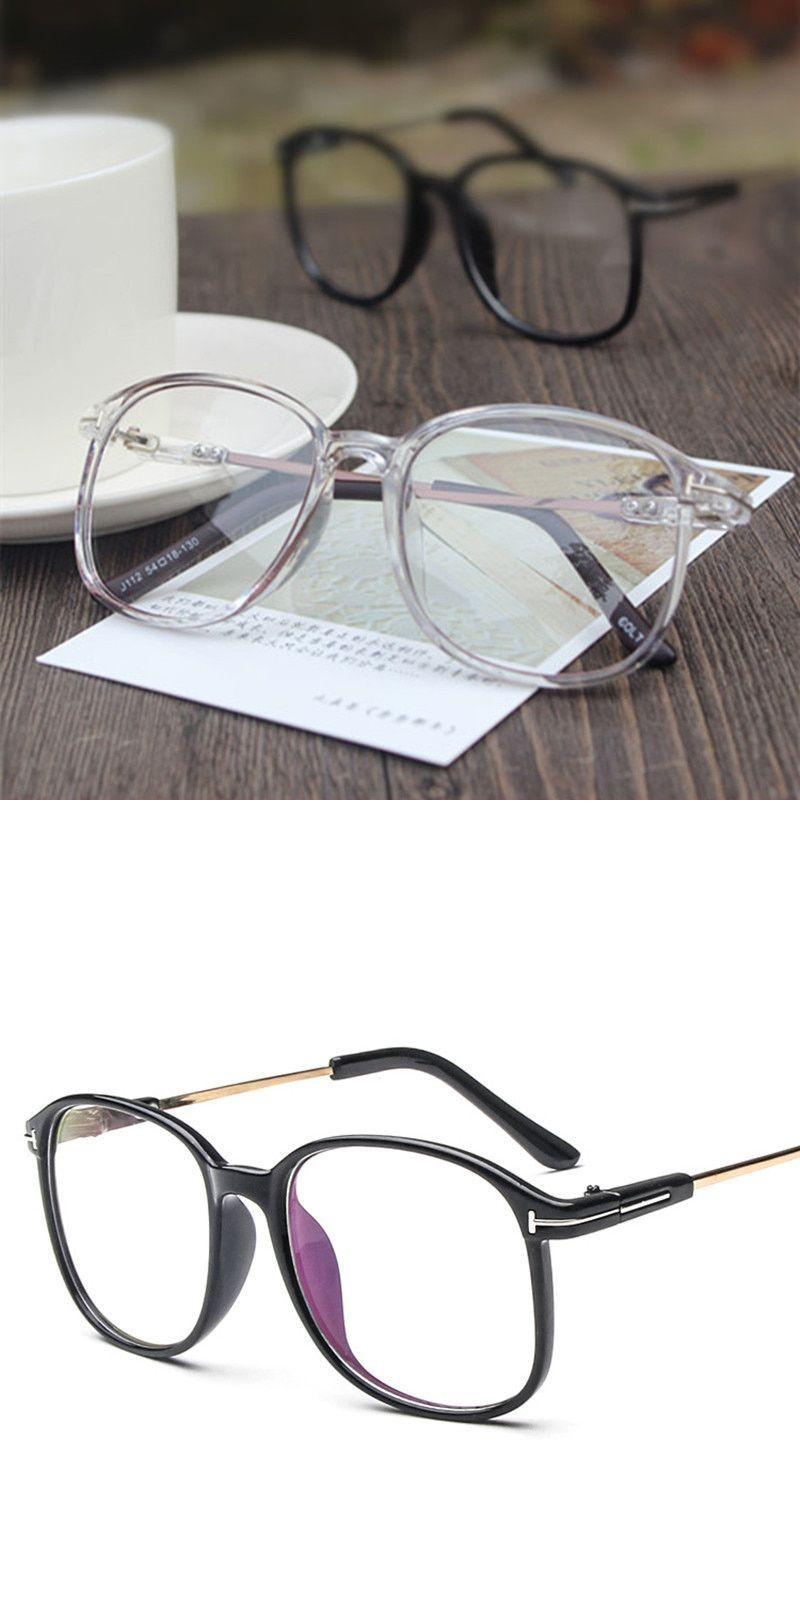 11b35b03a81 Discover ideas about Oversized Glasses. High quality oversized glasses  frame retro transparent eyeglasses women eyewear frames spectacle optical  myopia ...